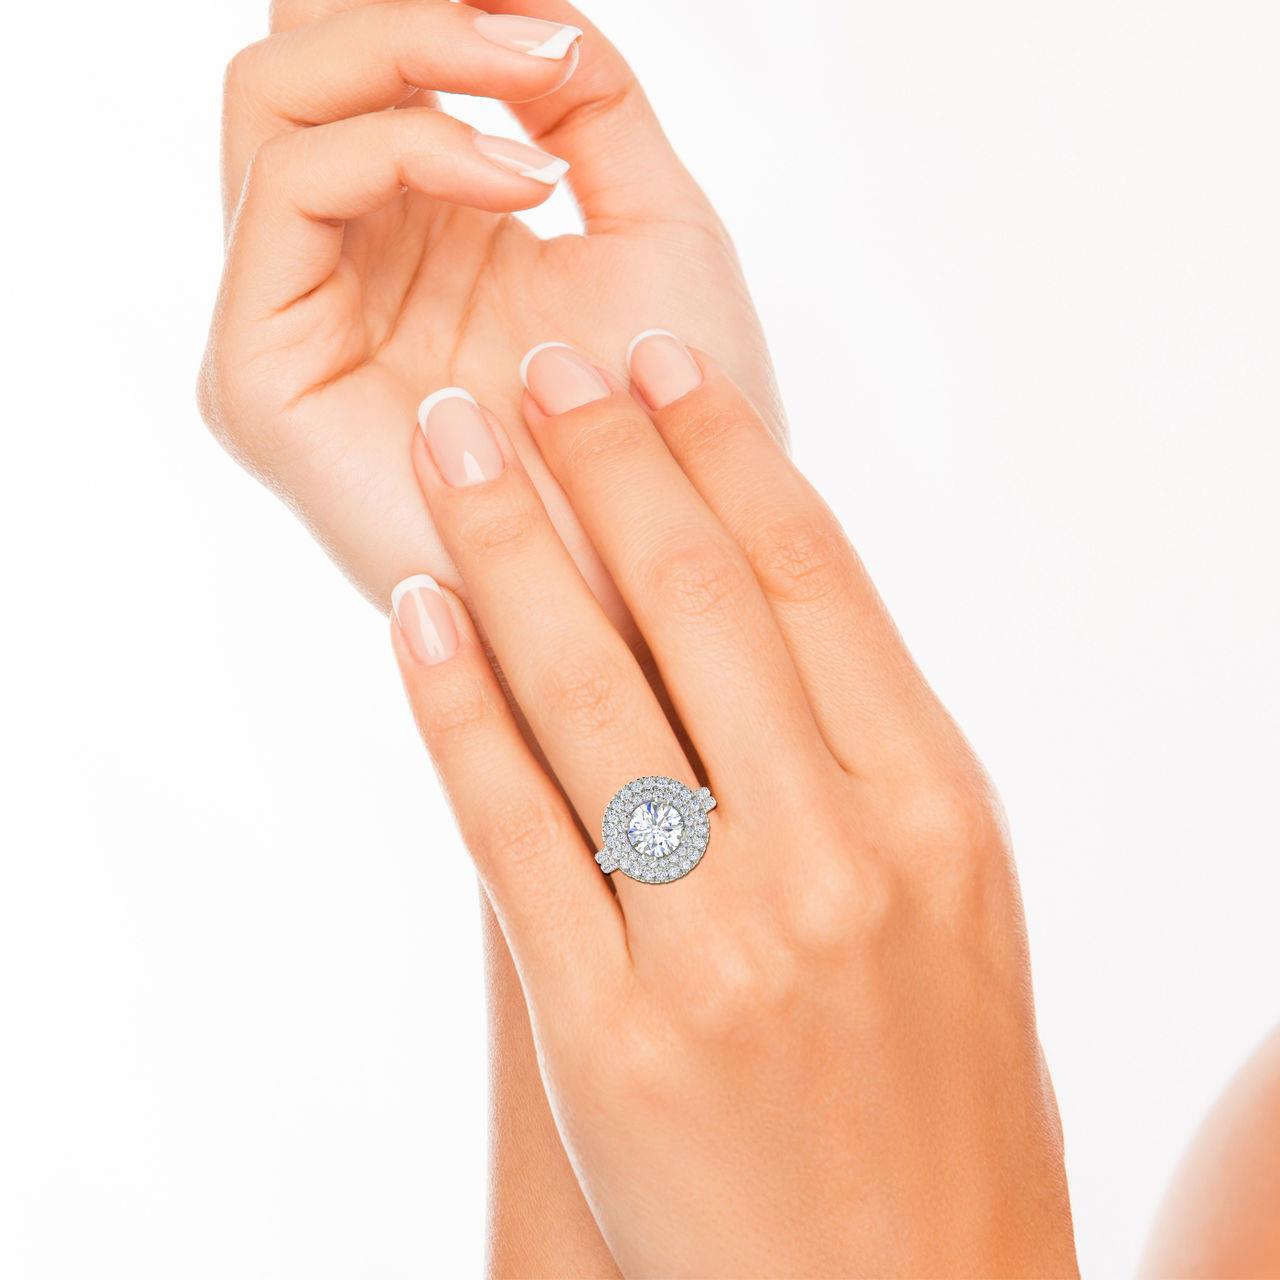 Double Halo 1.9 Carat Round Cut Diamond Engagement Ring